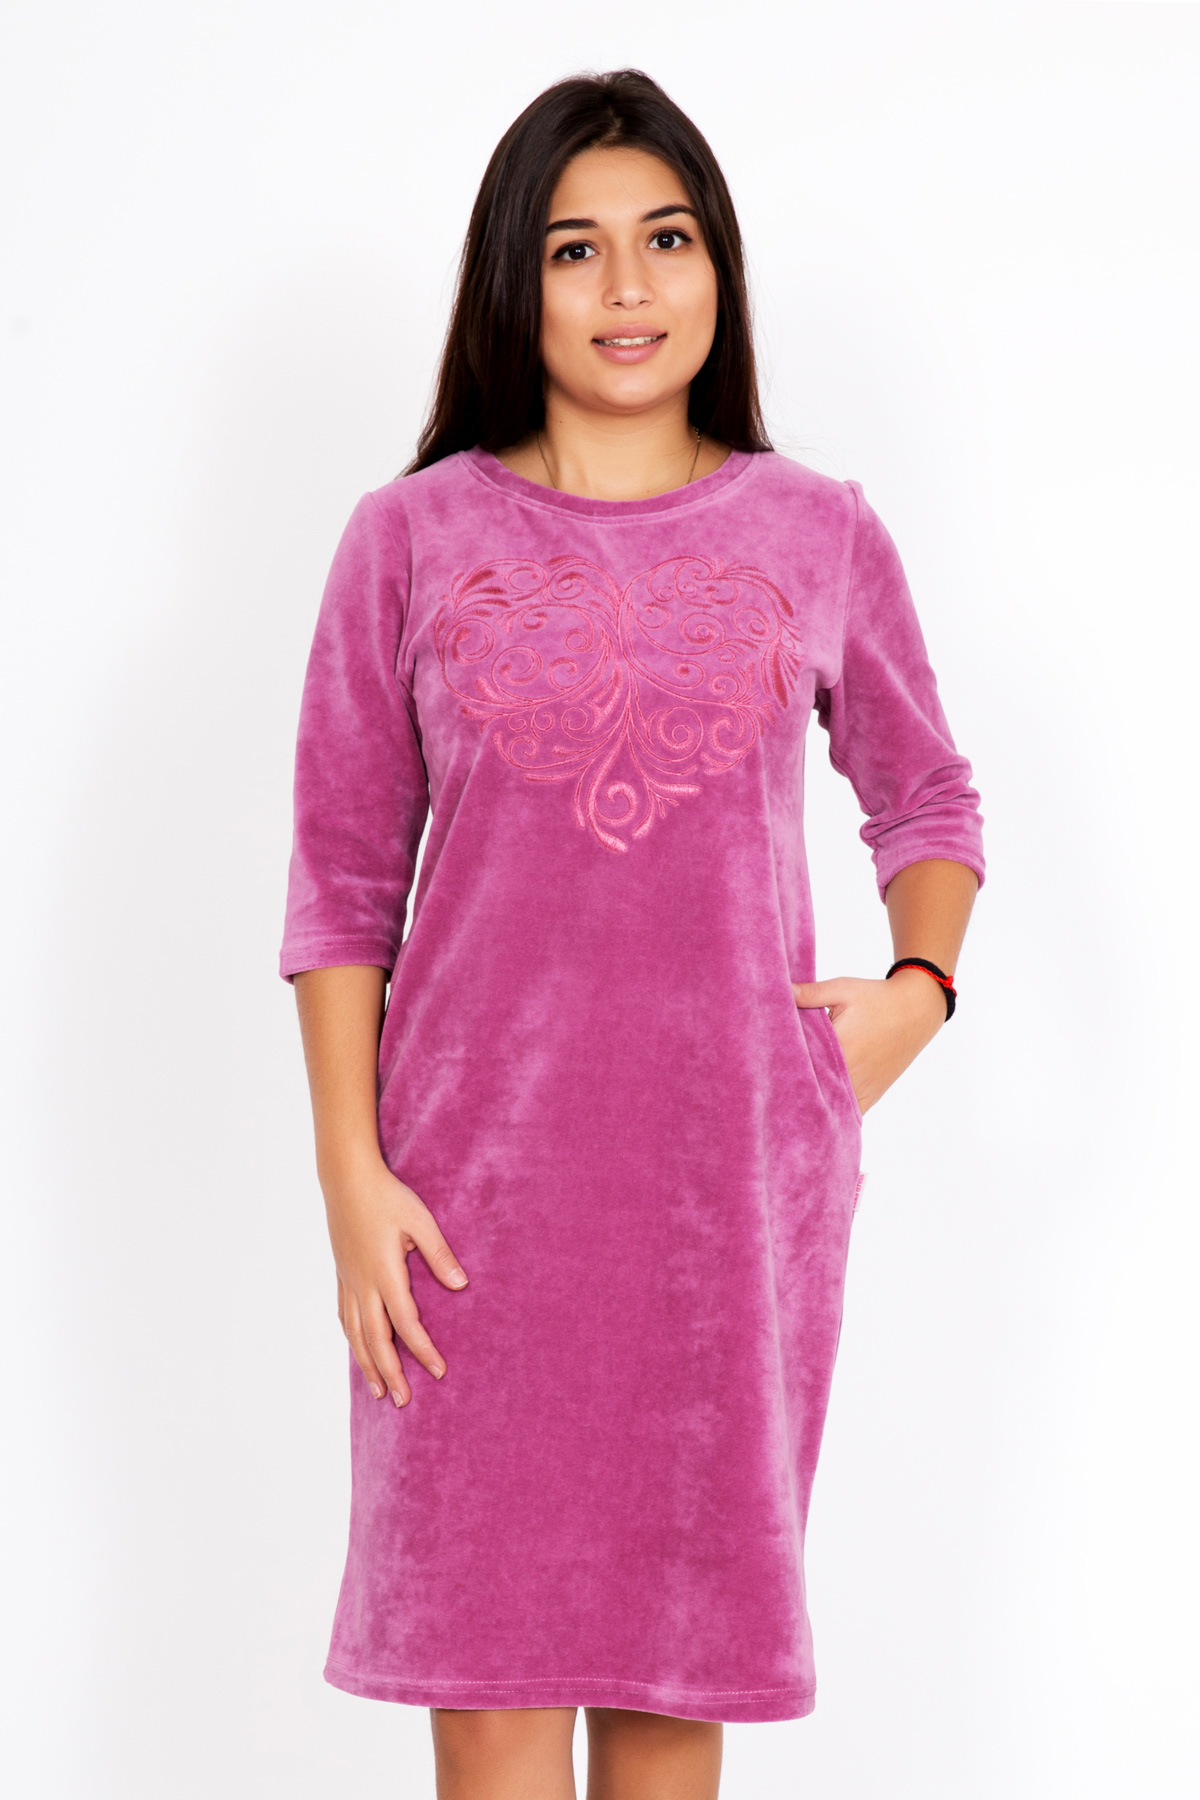 Жен. платье Аврелия р. 48Платья<br>Факт. ОГ: 102 см <br>Факт. ОТ: 98 см <br>Факт. ОБ: 104 см <br>Длина по спинке: 93 см<br><br>Тип: Жен. платье<br>Размер: 48<br>Материал: Велюр